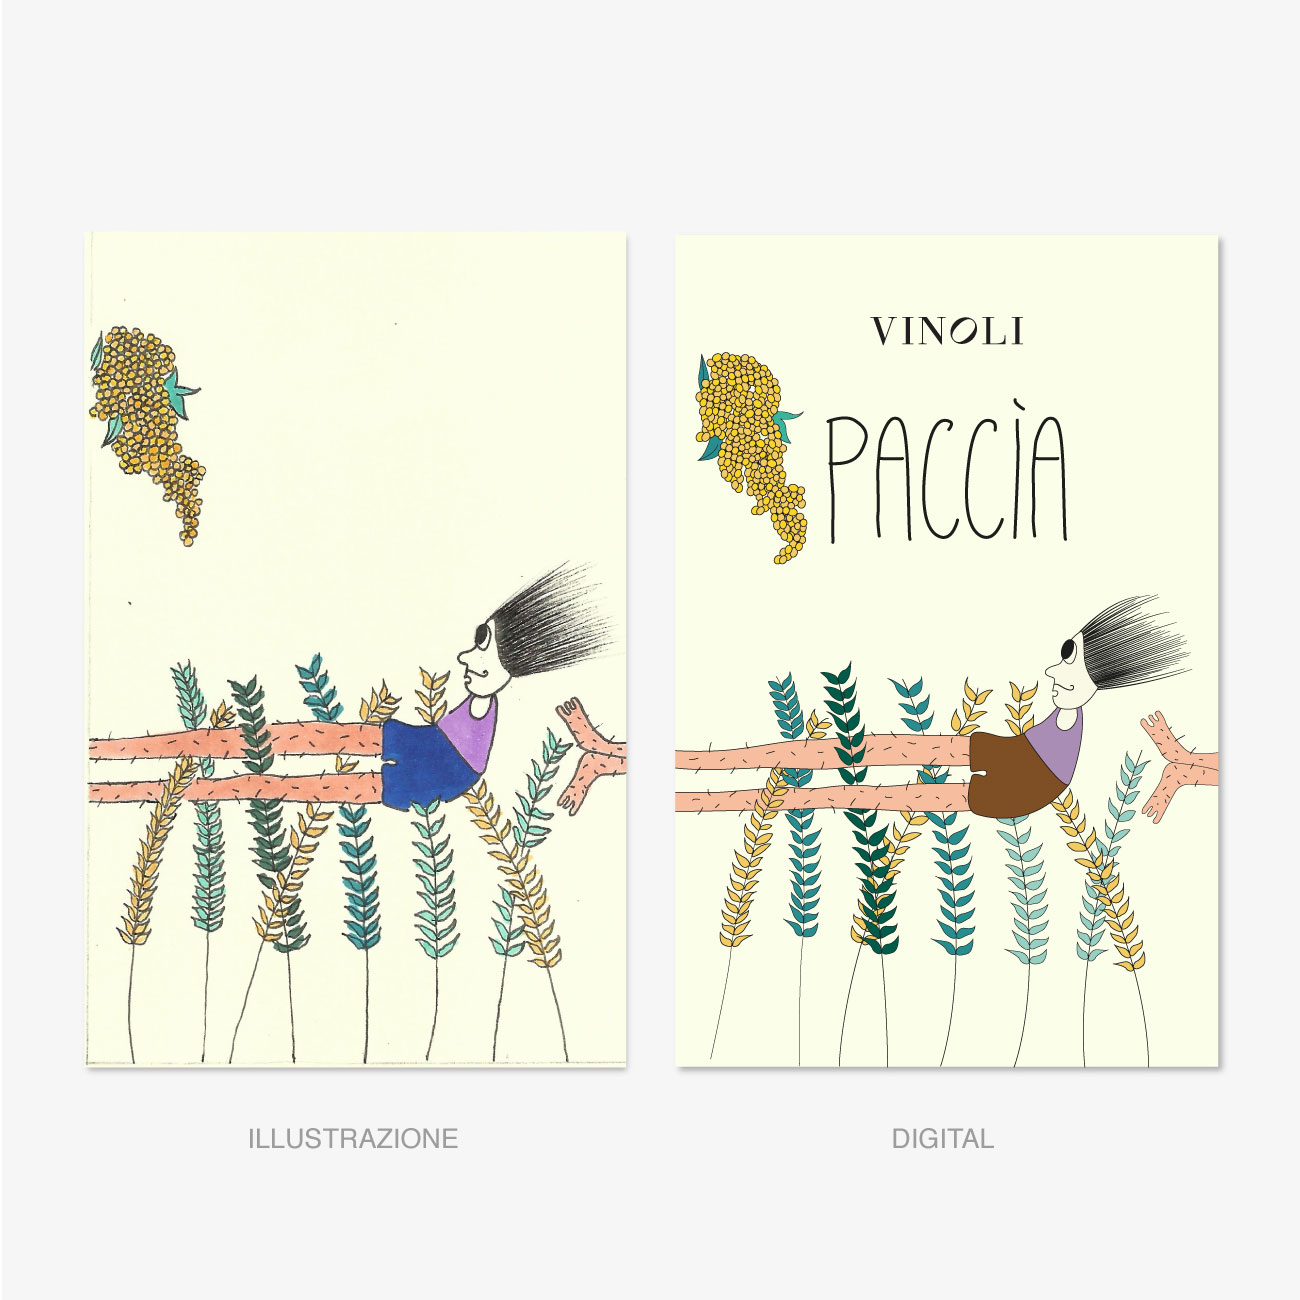 https://www.orlandinifrancesco.com/wp/wp-content/uploads/2019/07/Digital-Label-Paccia-Cantina-Vinoli.jpg